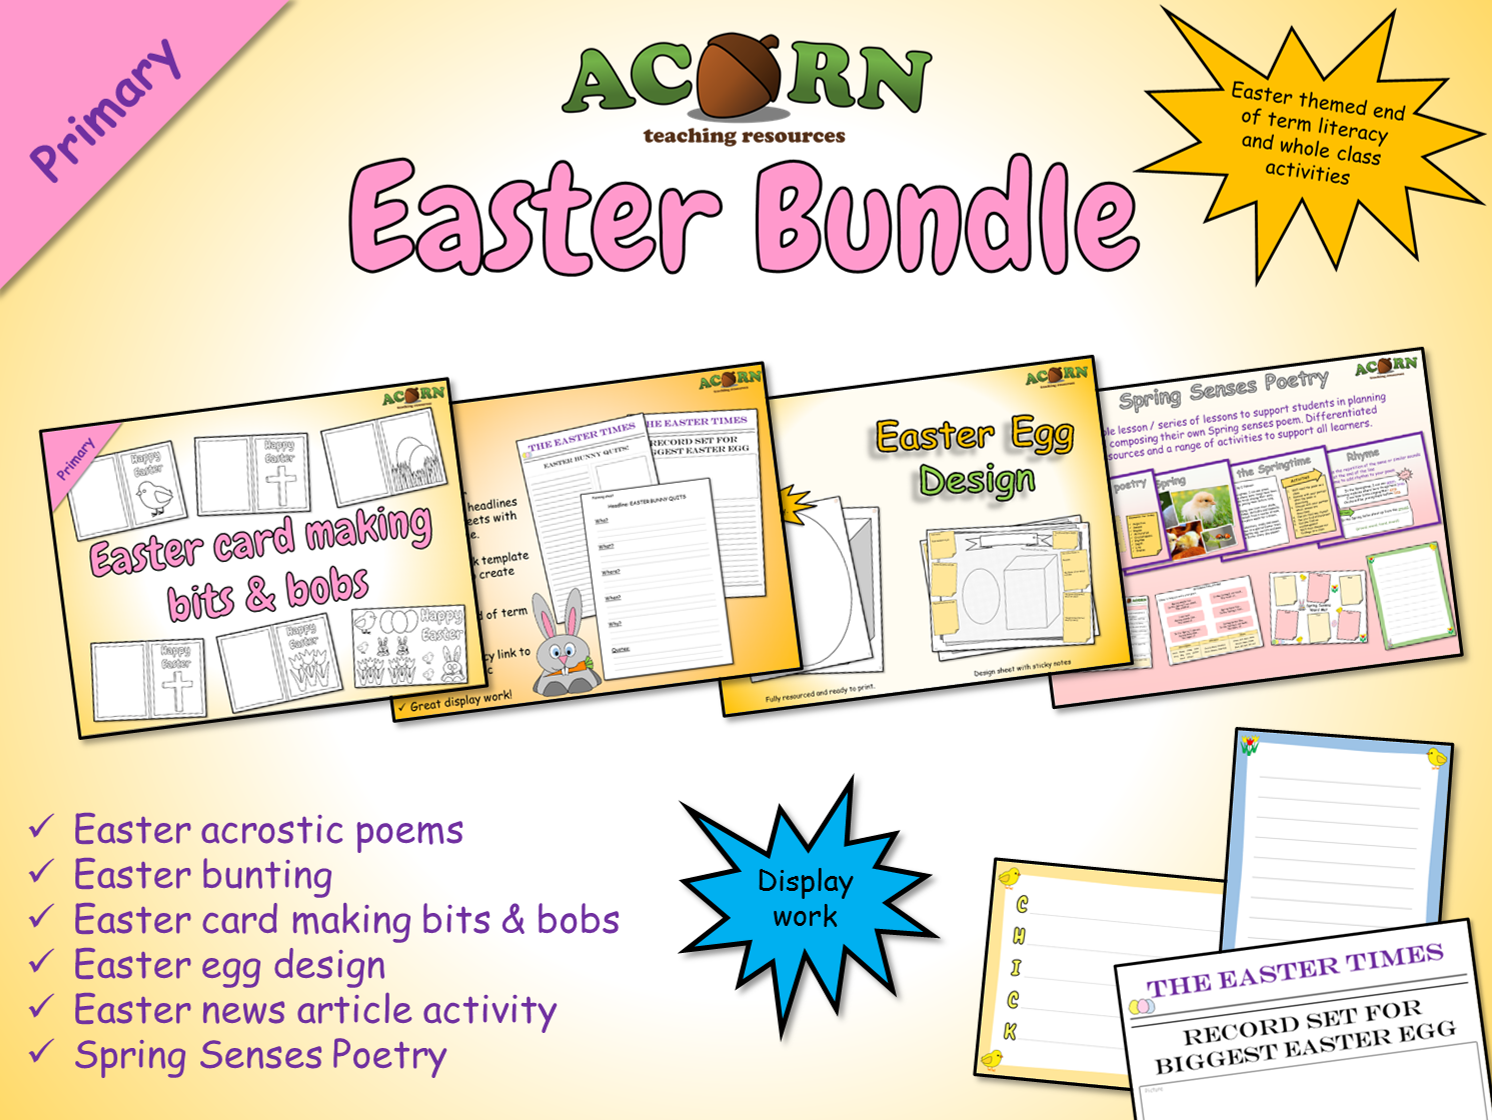 The Acorn Easter Bundle